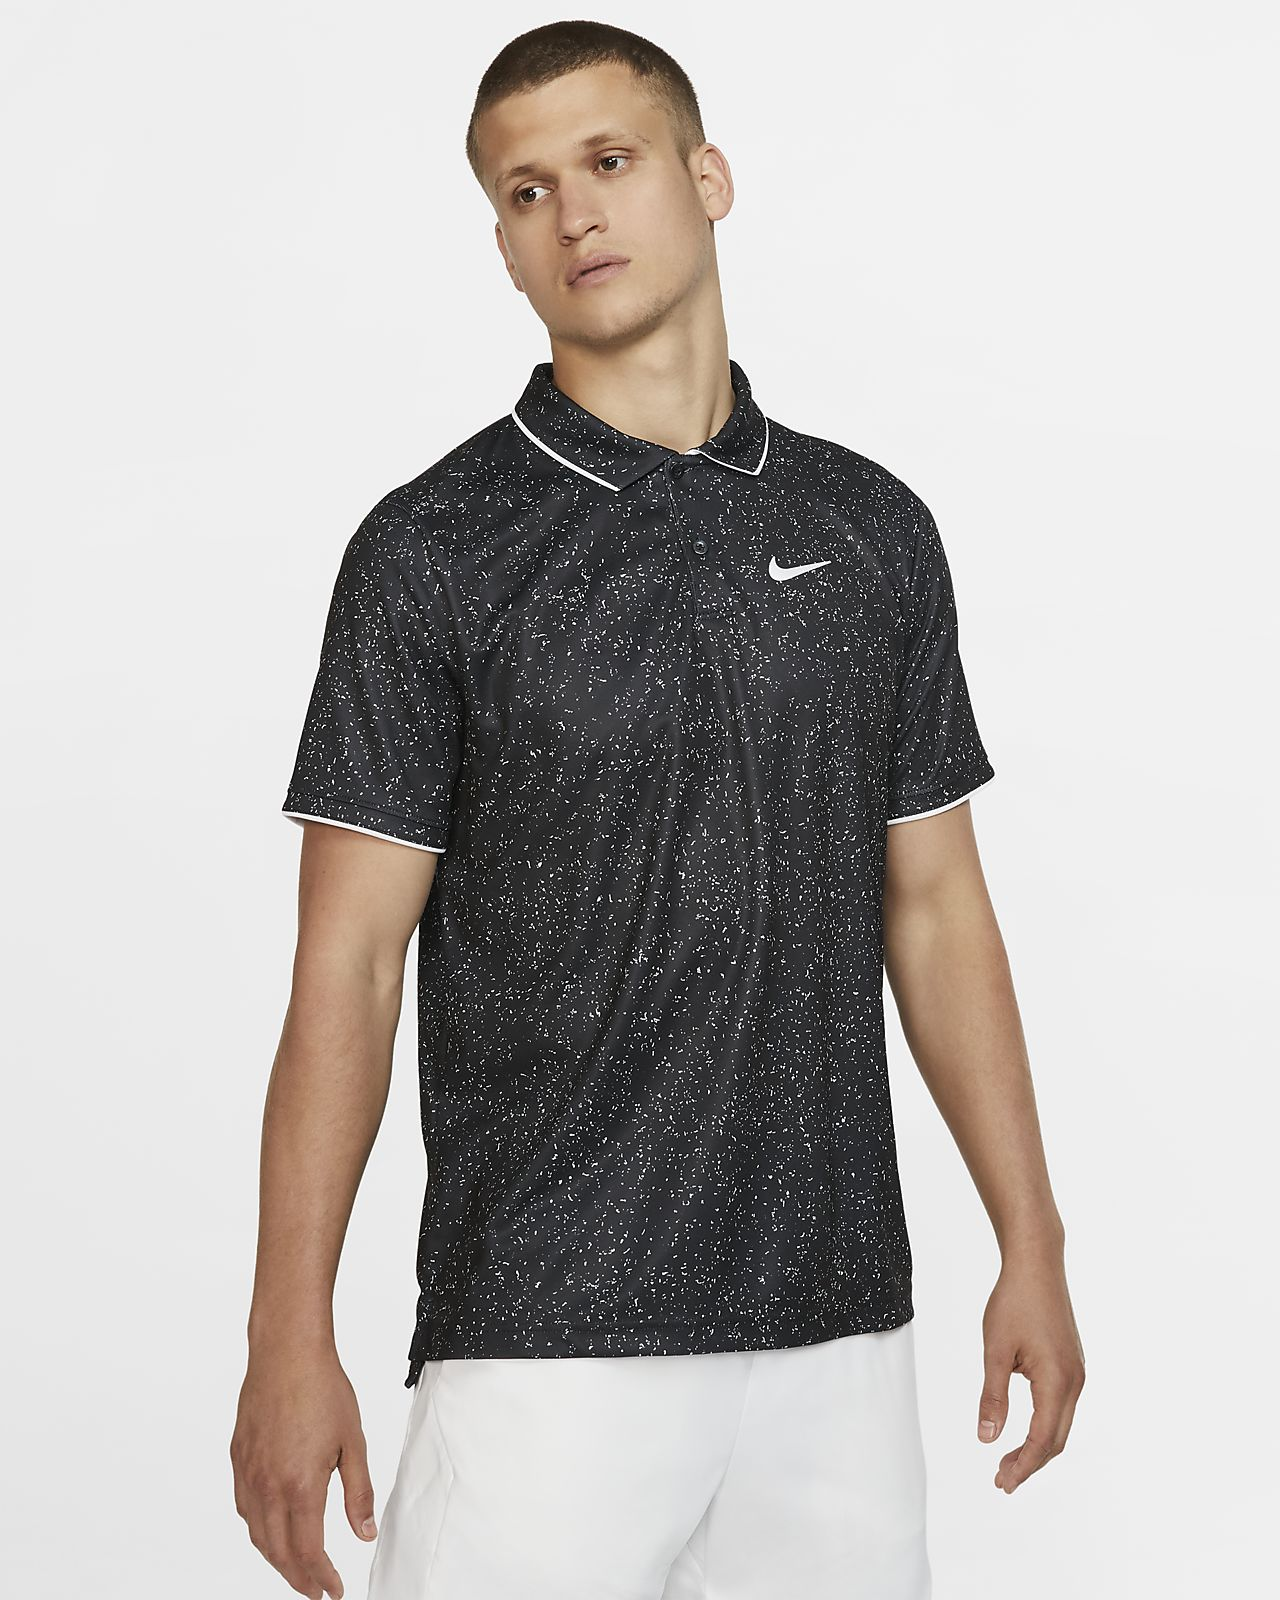 NikeCourt Dri-FIT mønstret tennisskjorte til herre